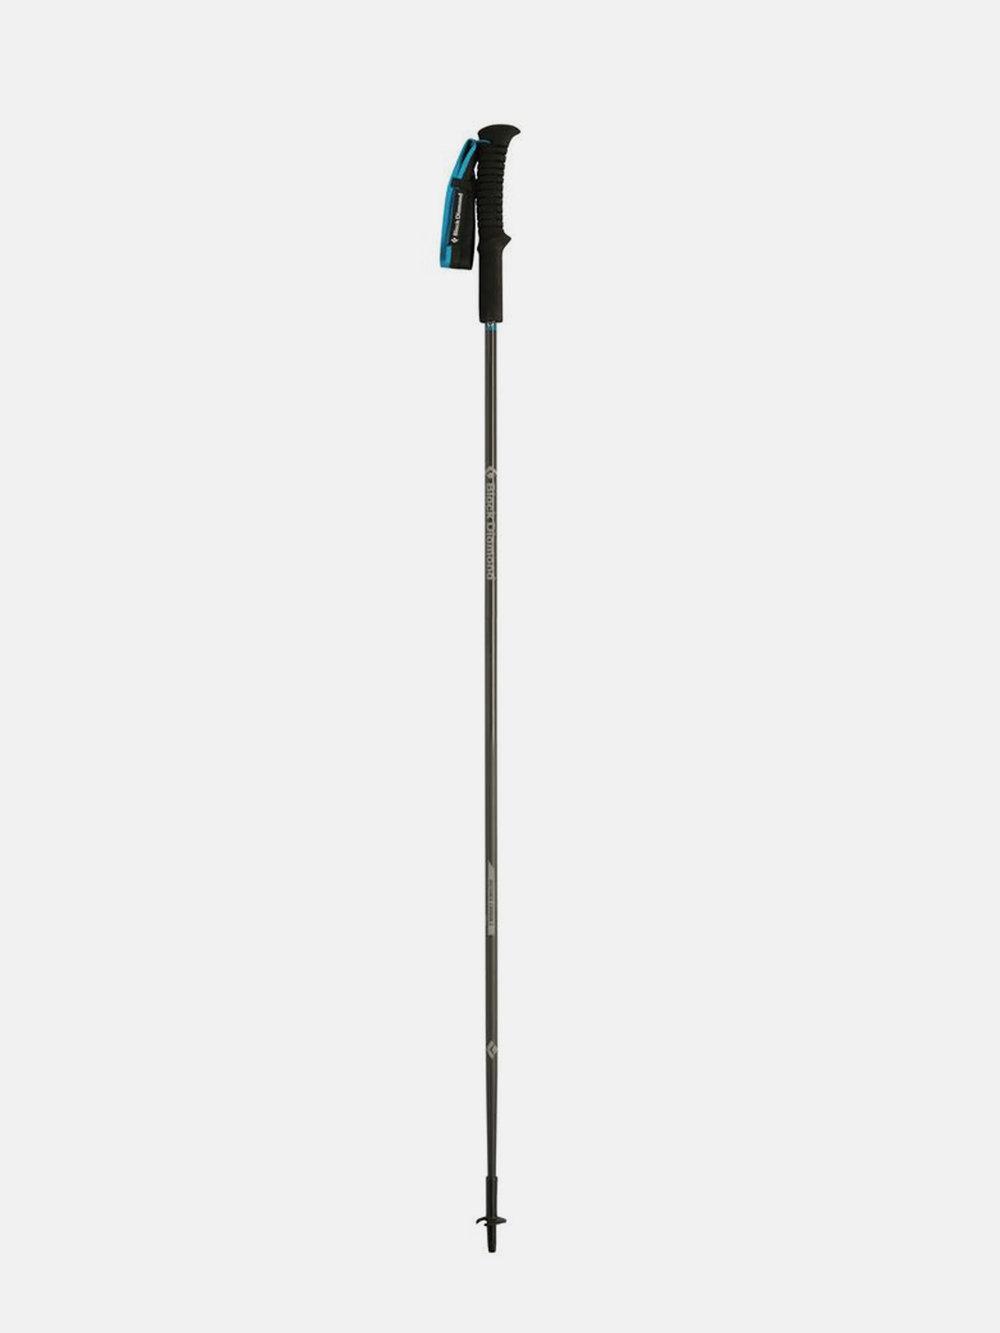 Black Diamond Hiking Poles - $103.97